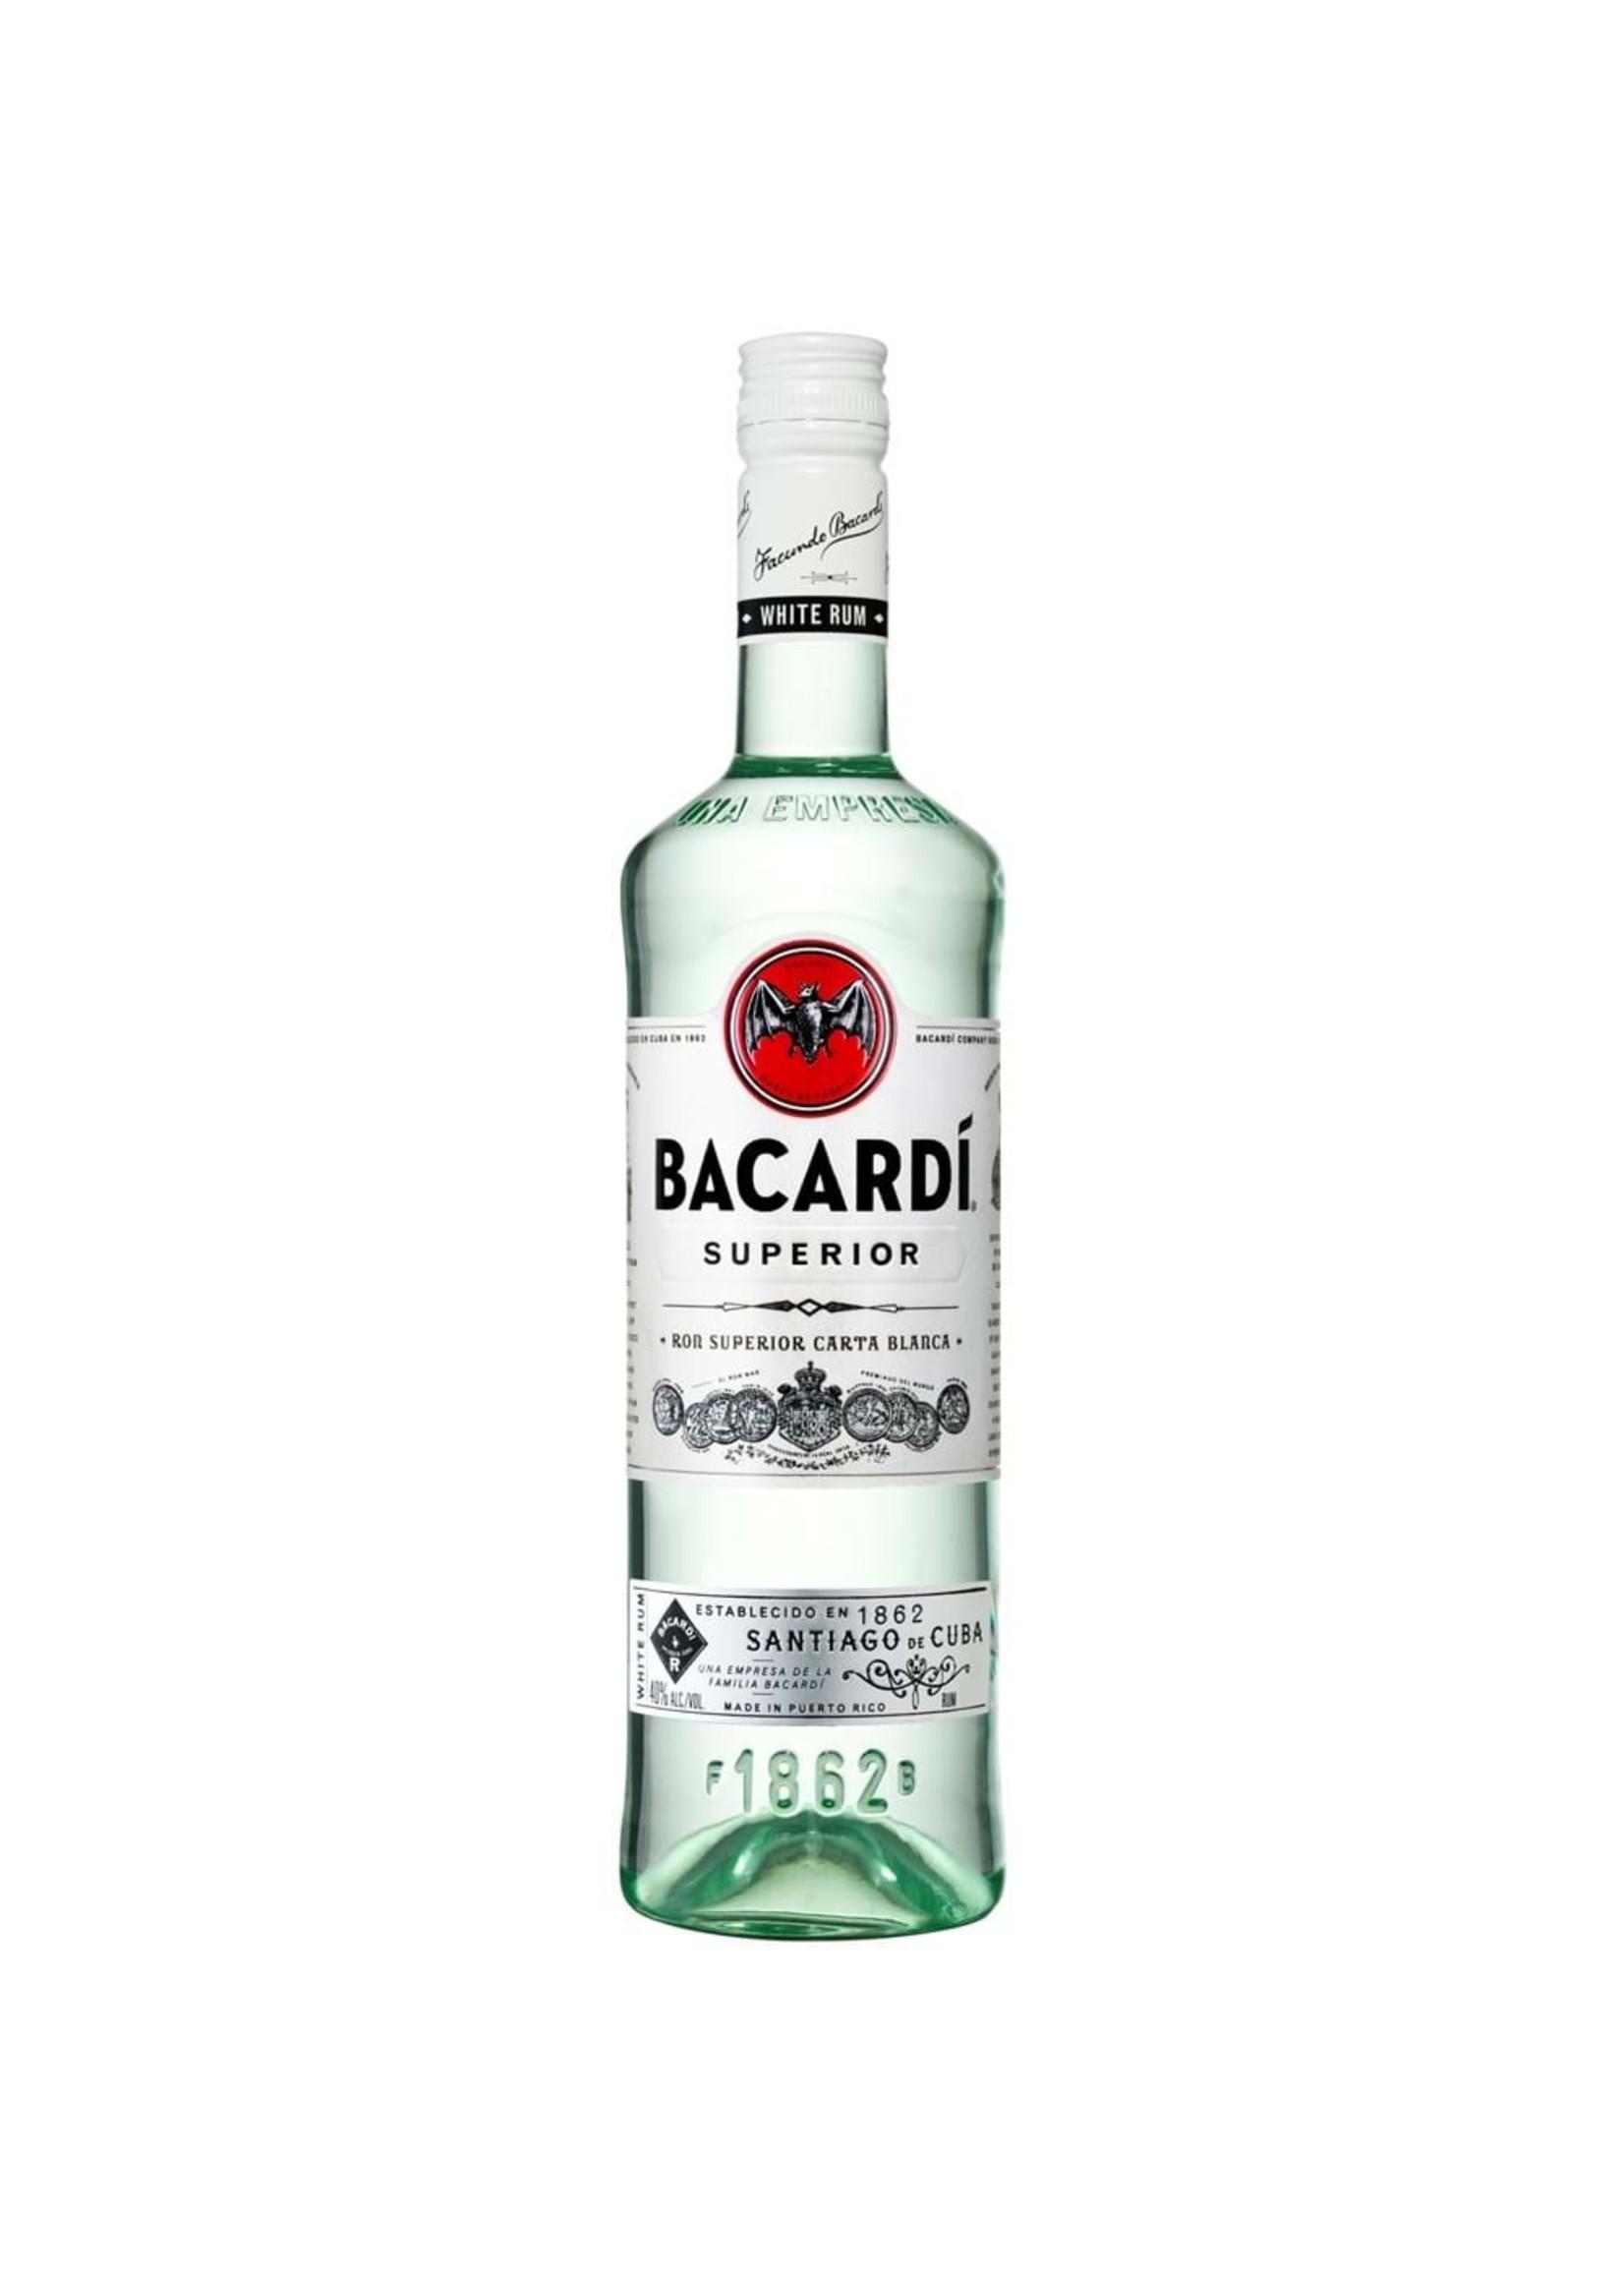 BACARDI Bacardi / Superior